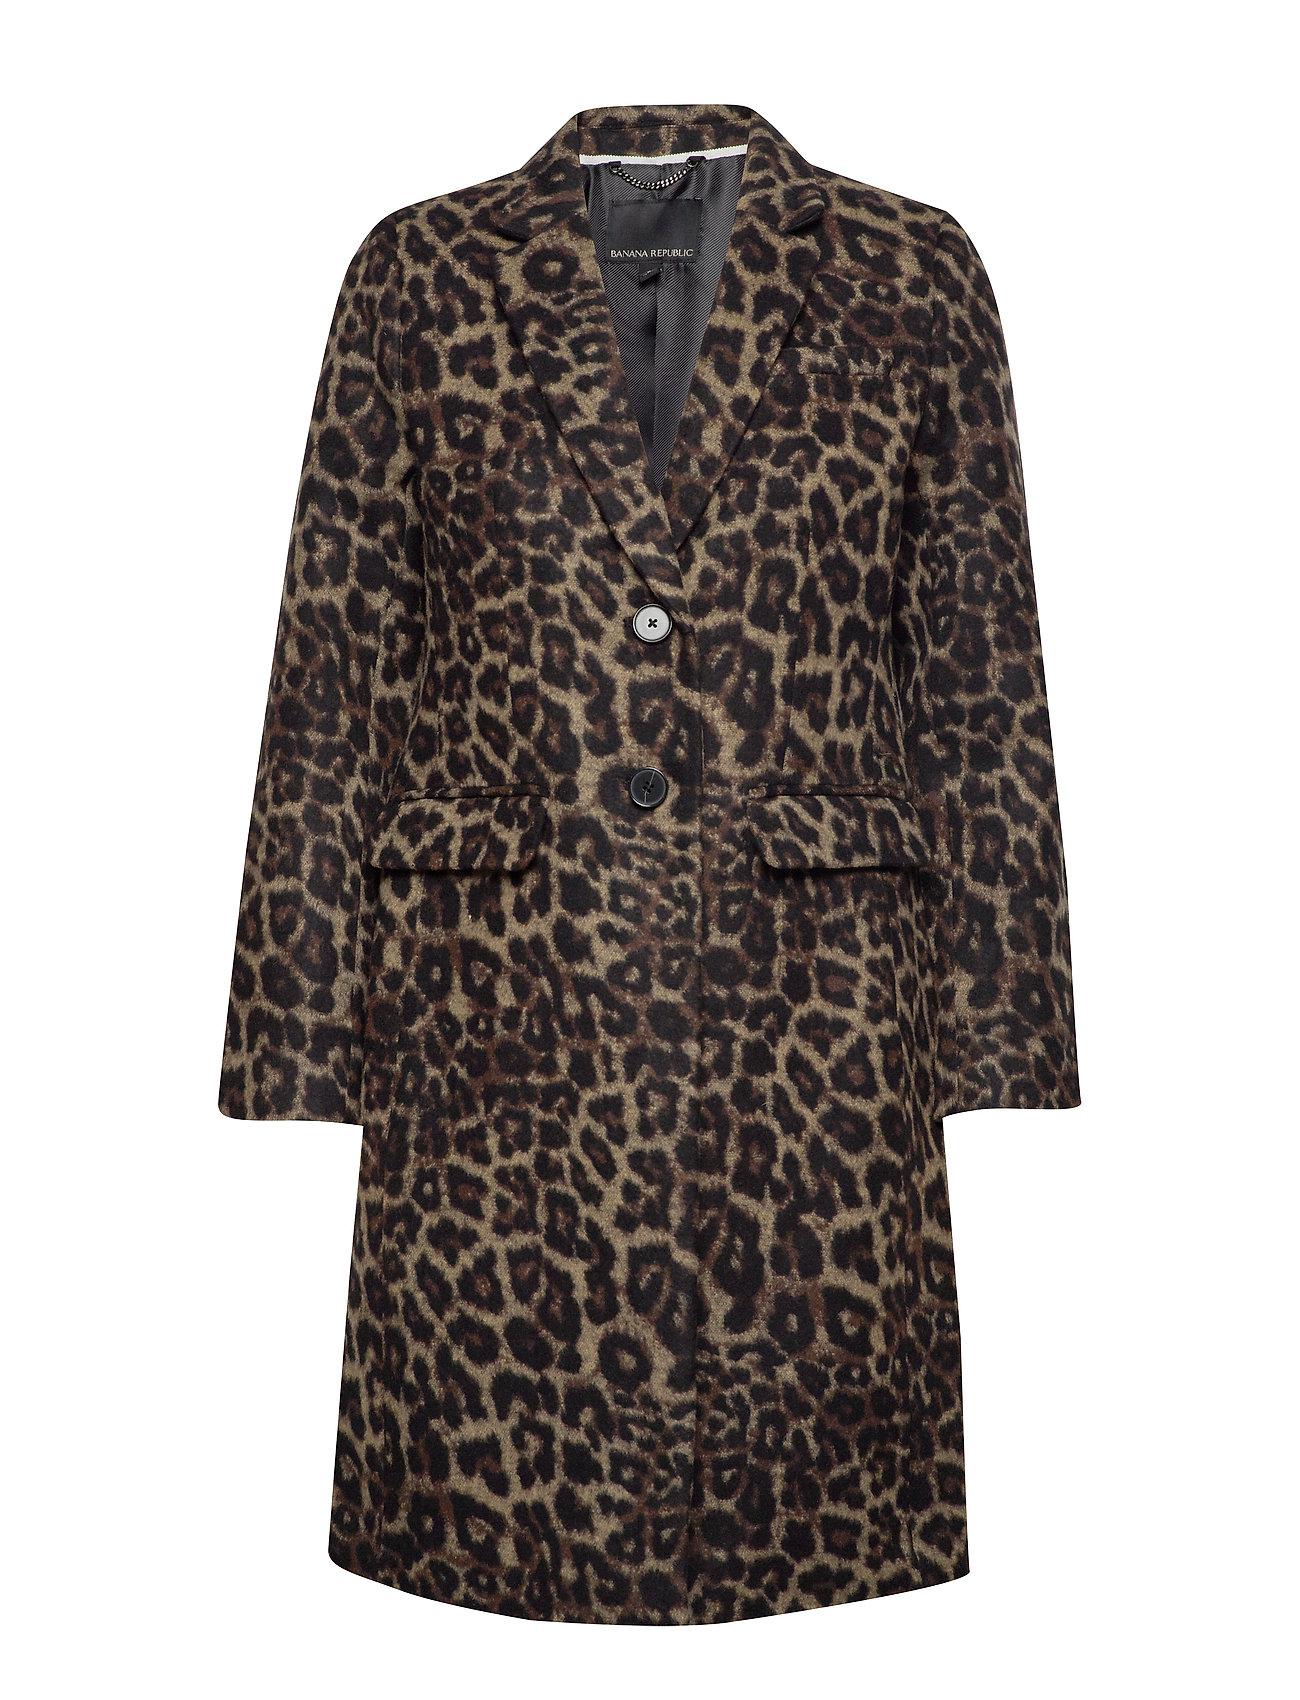 Banana Republic Leopard Print Top Coat - CAMEL/ANIMAL PRINT